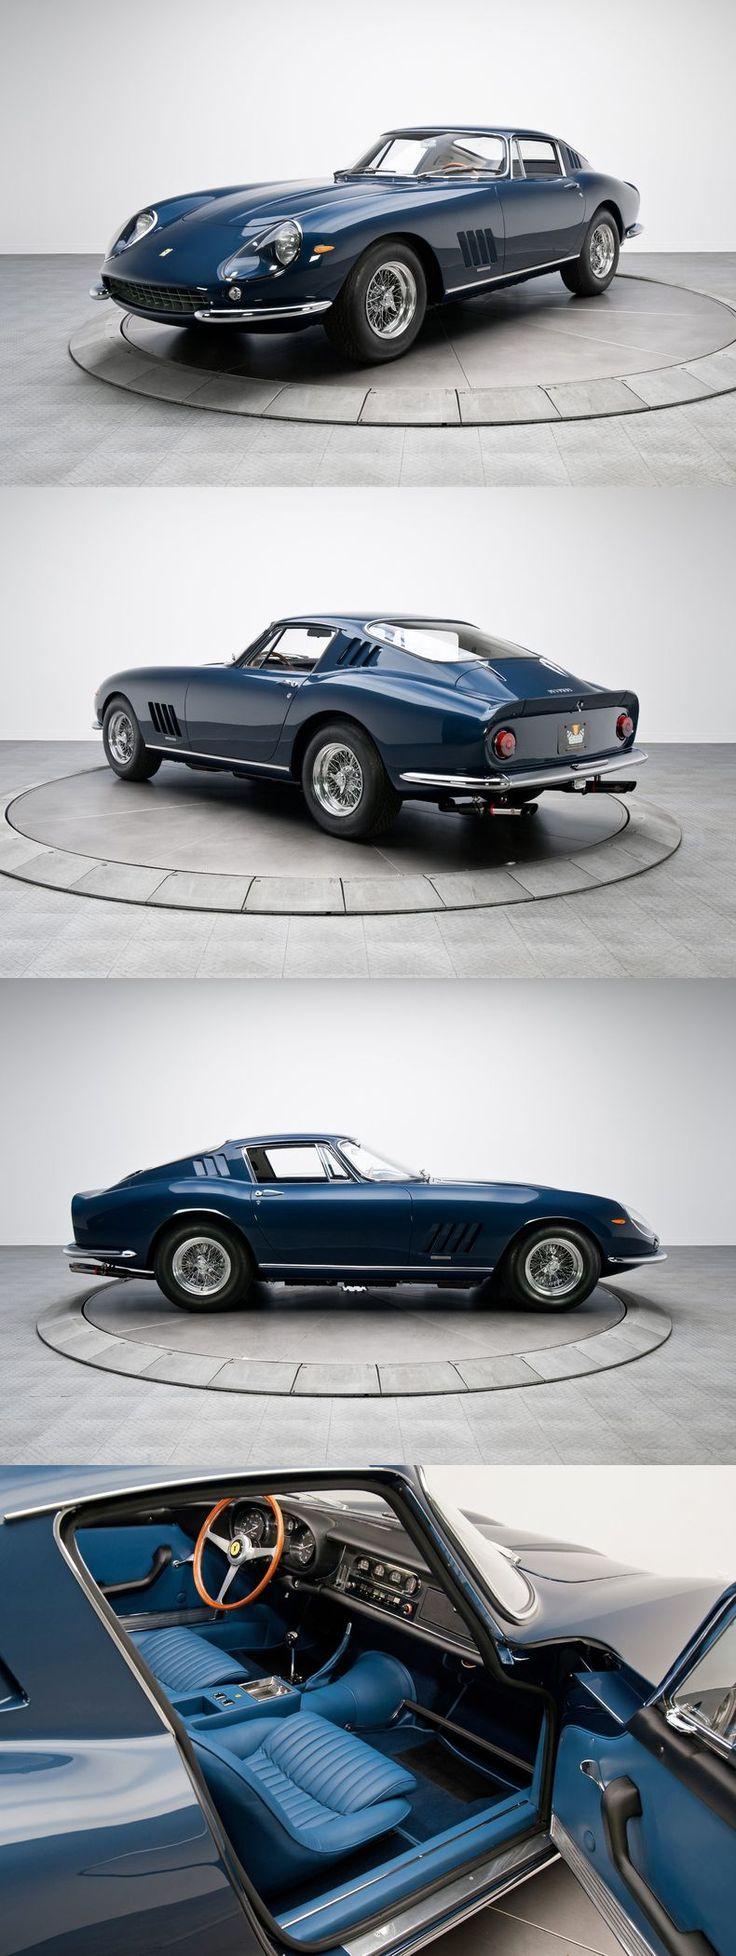 1967 Ferrari 275 GTB/4 ✏✏✏✏✏✏✏✏✏✏✏✏✏✏✏✏ AUTRES VEHICULES - OTHER VEHICLES ☞ https://fr.pinterest.com/barbierjeanf/pin-index-voitures-v%C3%A9hicules/ ══════════════════════ BIJOUX ☞ https://www.facebook.com/media/set/?set=a.1351591571533839&type=1&l=bb0129771f ✏✏✏✏✏✏✏✏✏✏✏✏✏✏✏✏